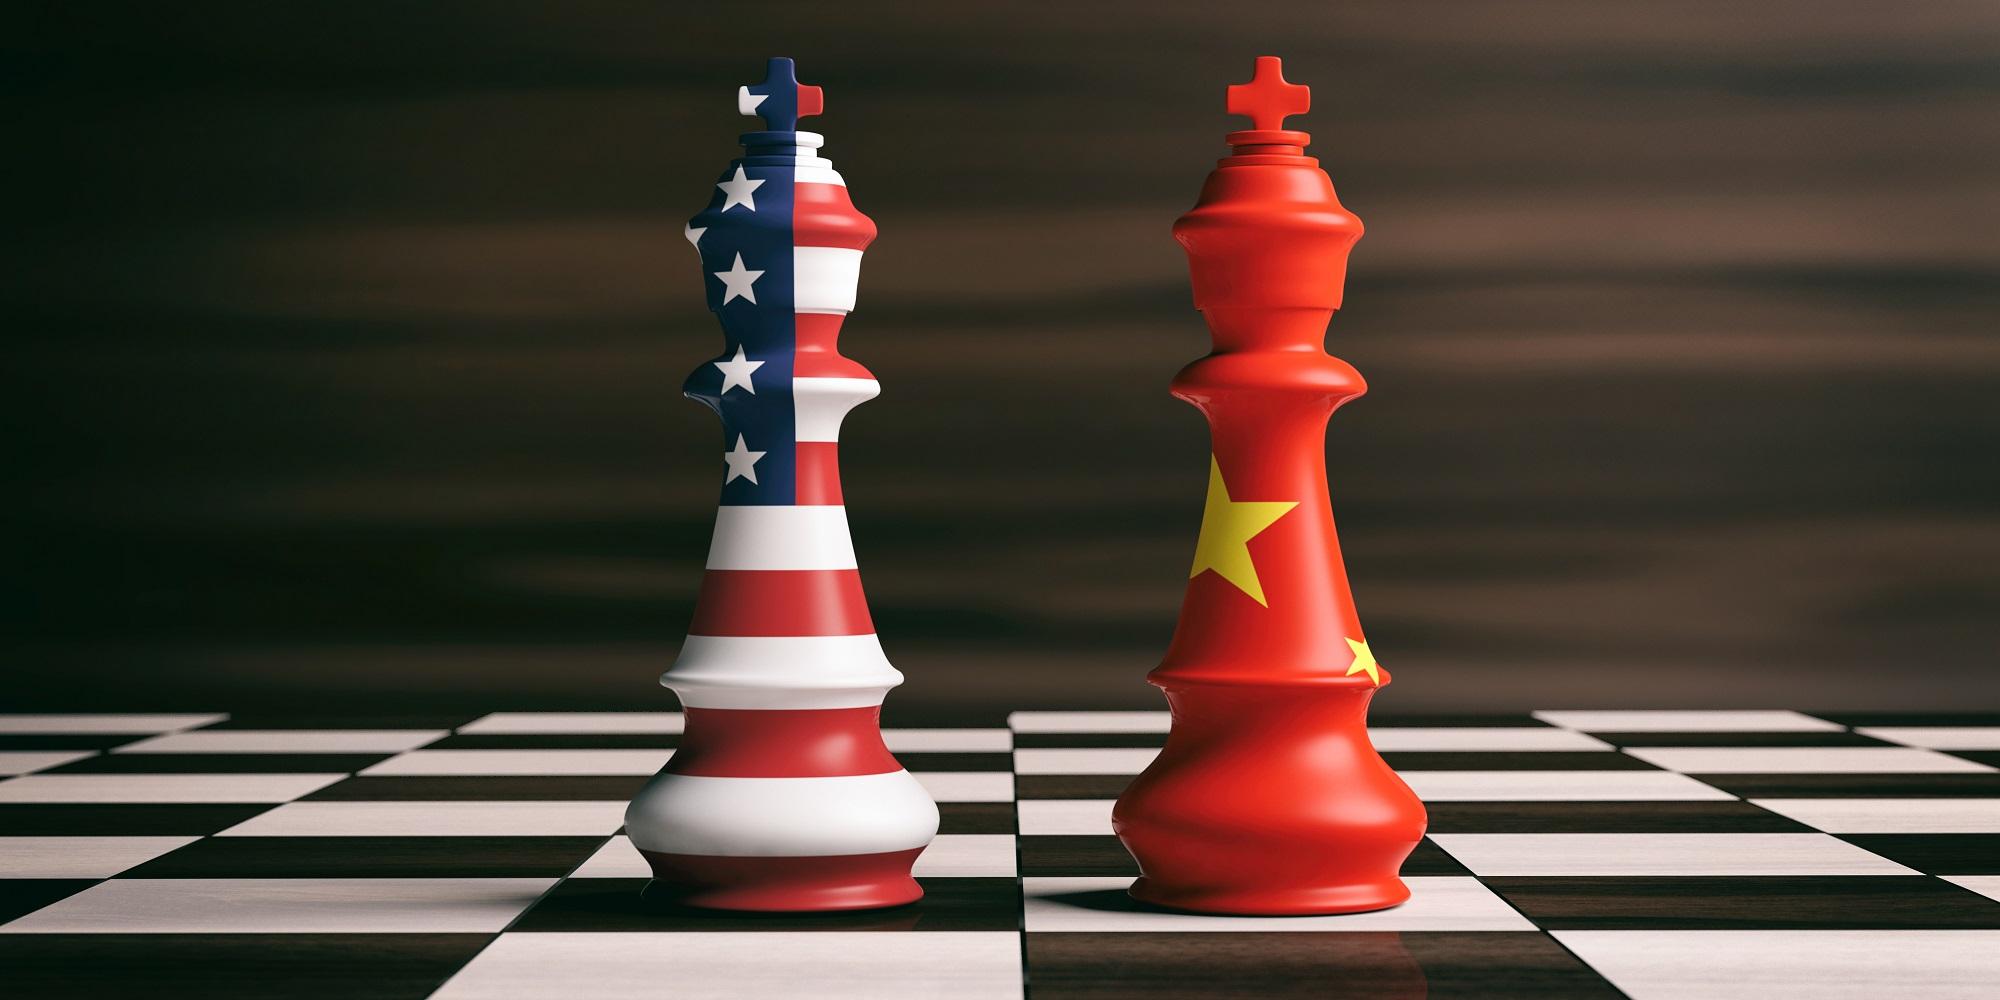 stck-us-china-chess-game